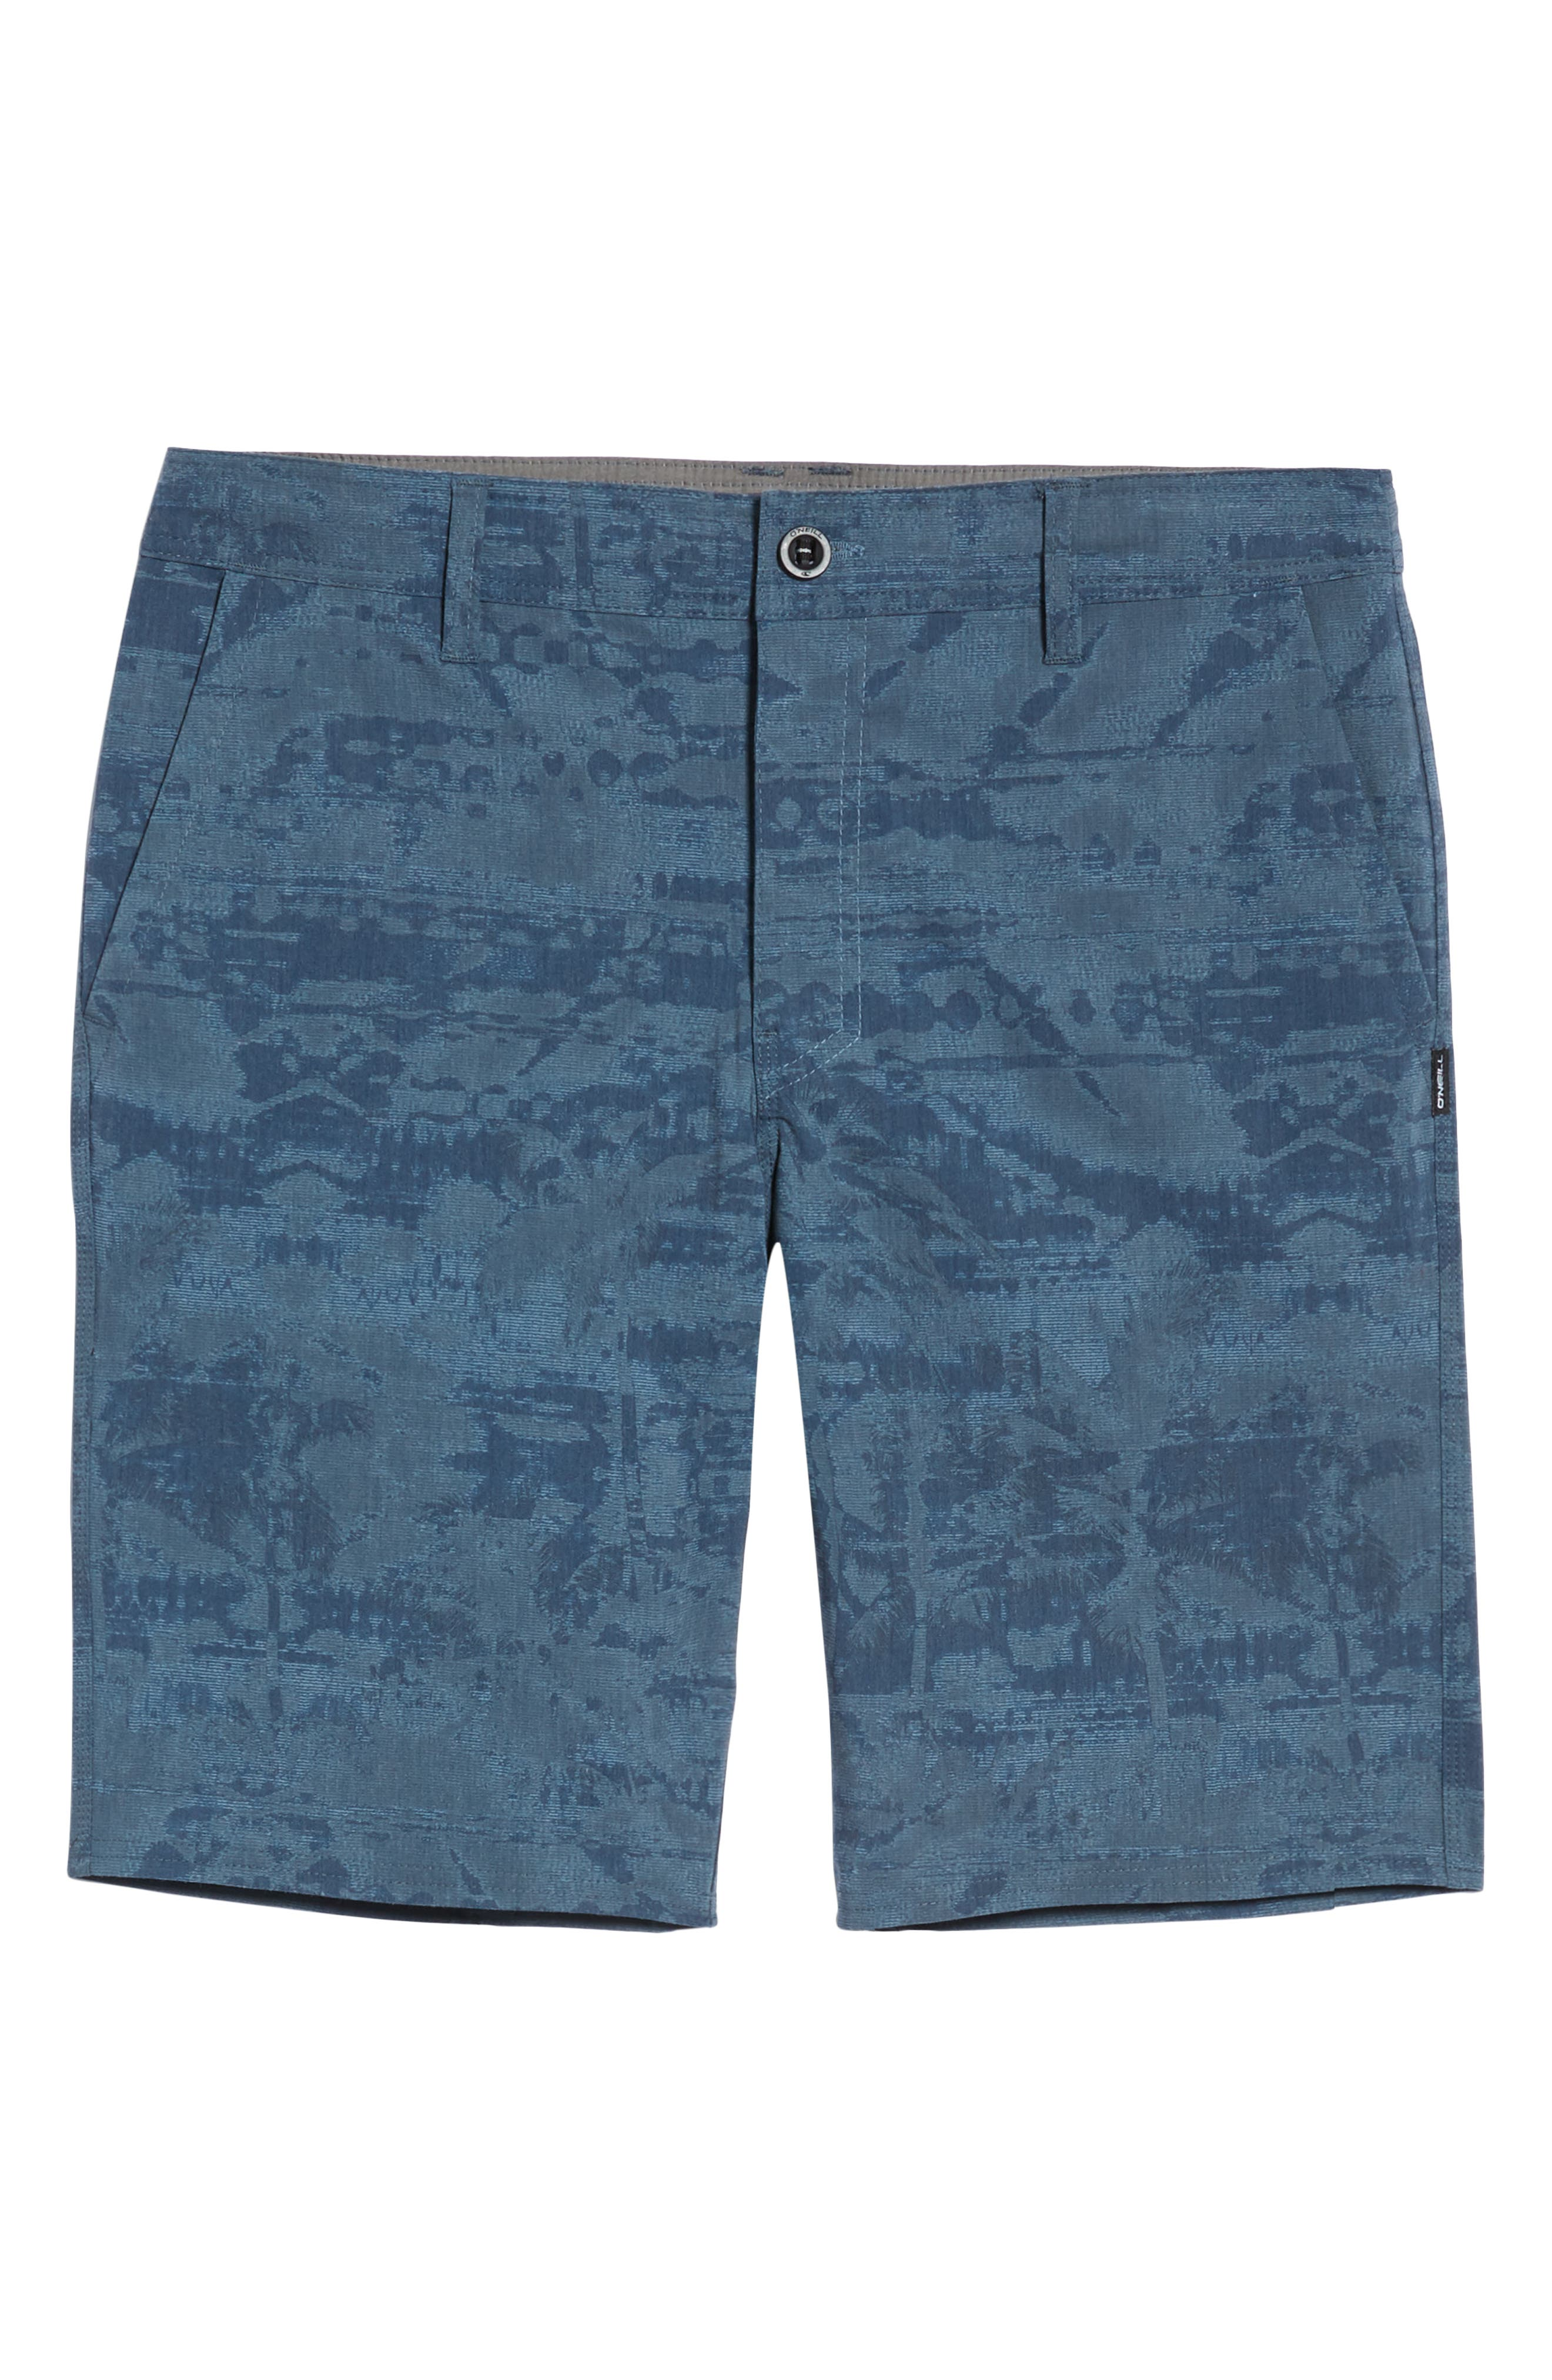 Mixed Hybrid Shorts,                             Alternate thumbnail 6, color,                             NAVY